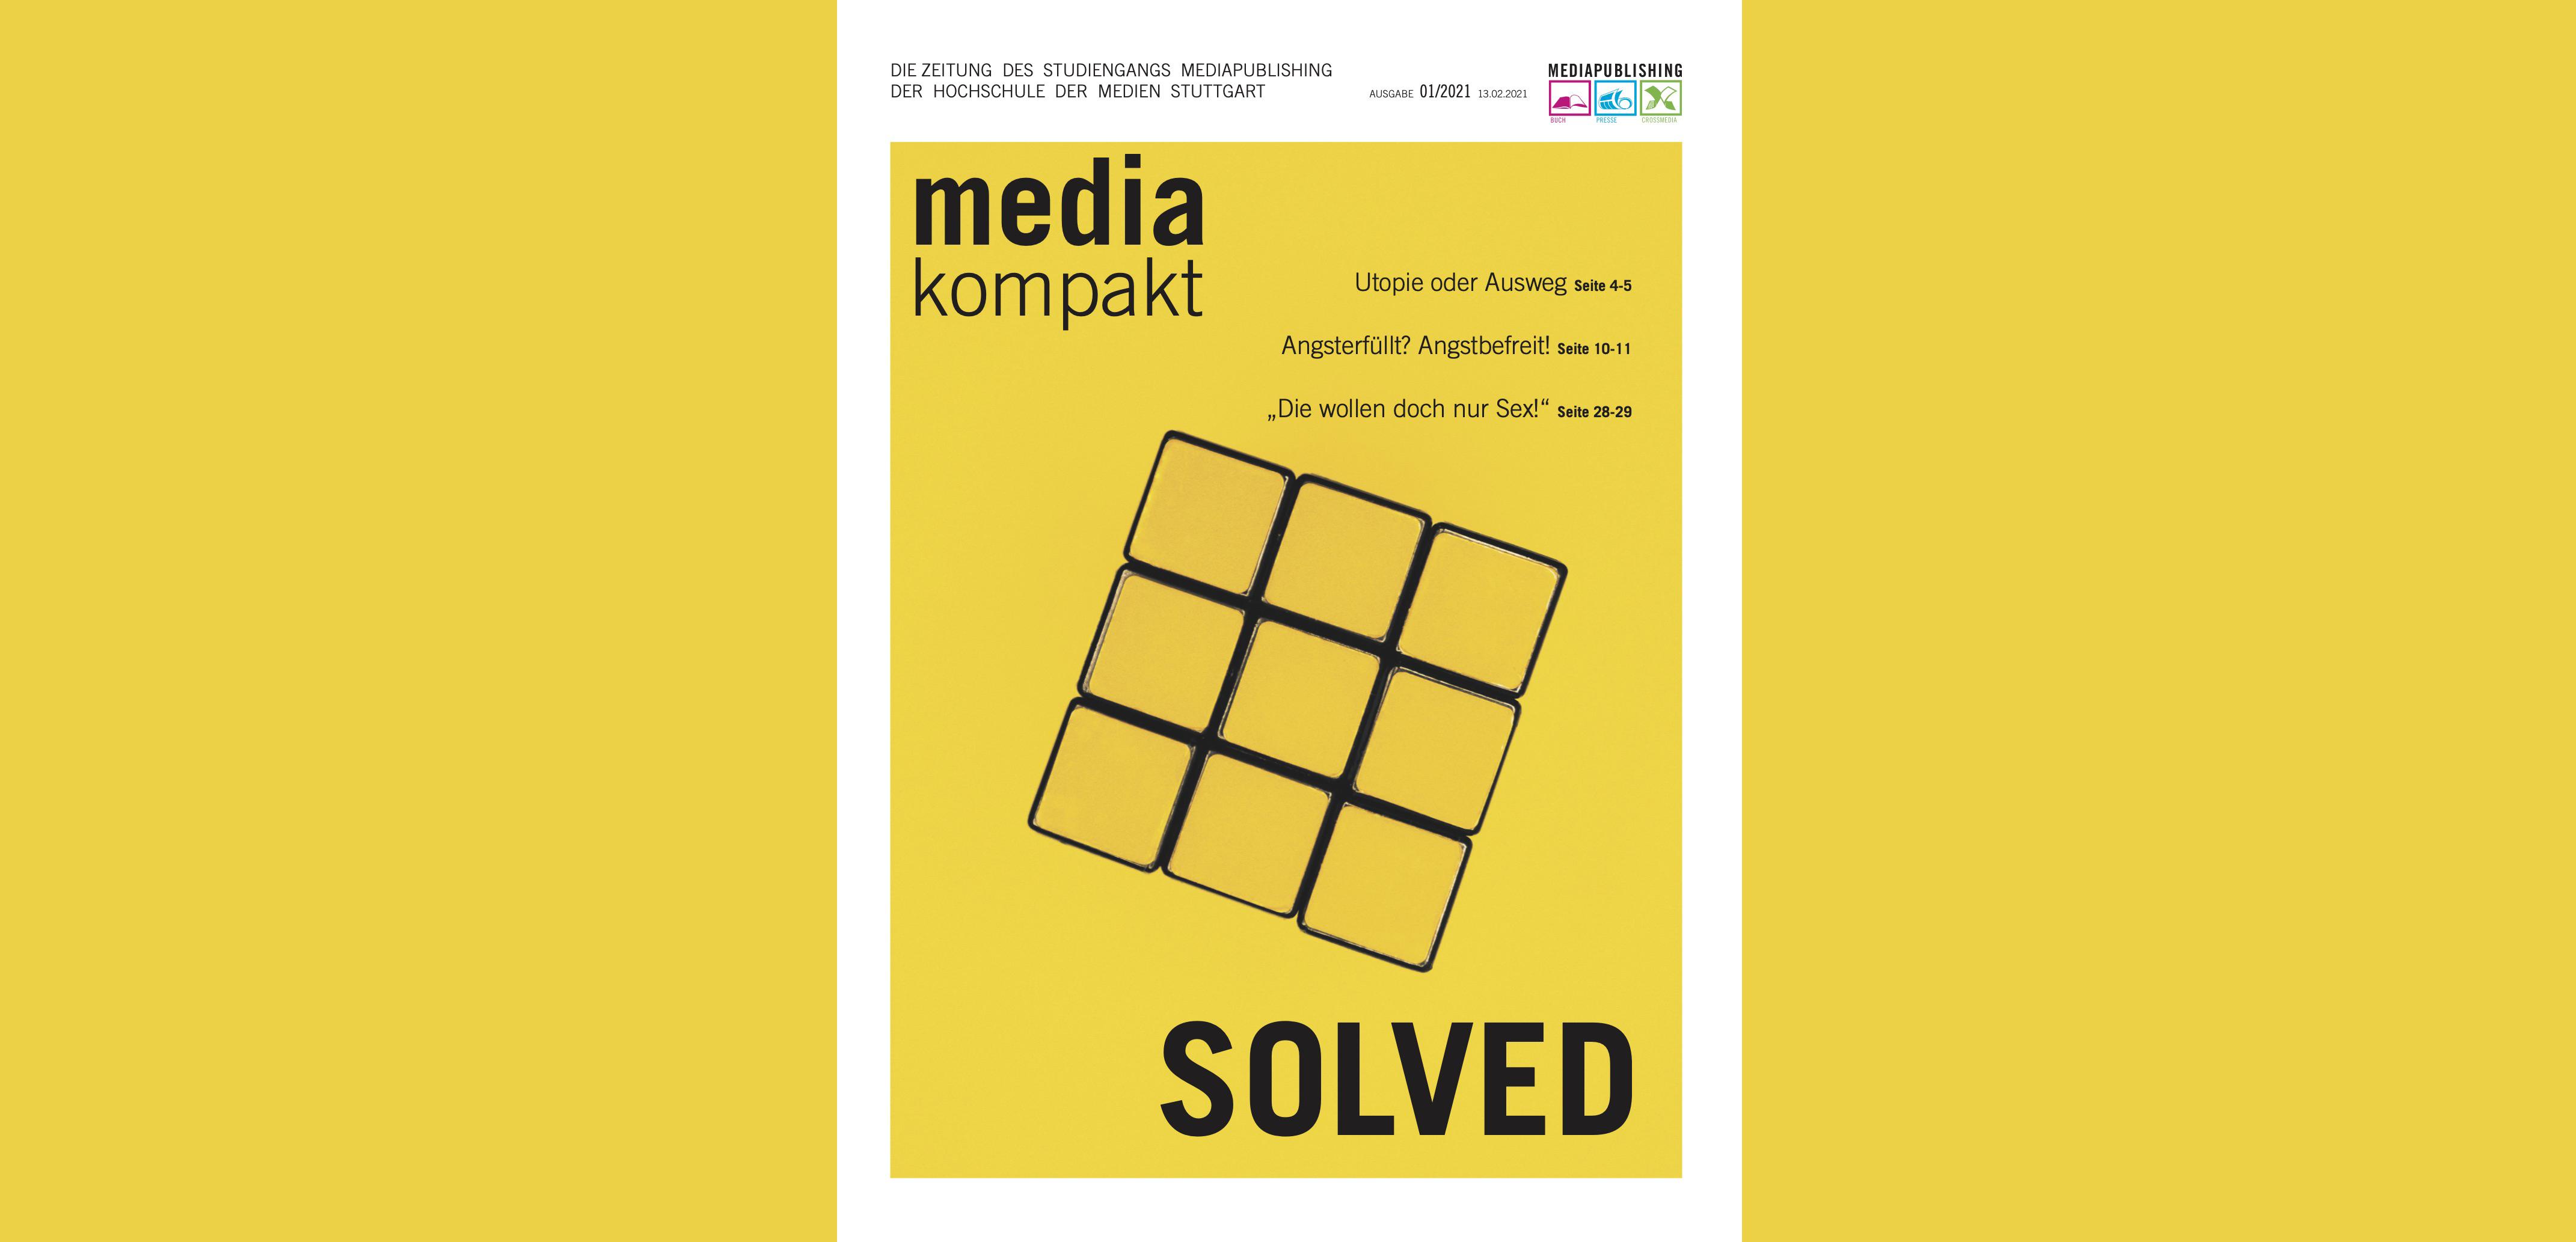 MEDIAkompakt jetzt lesen!